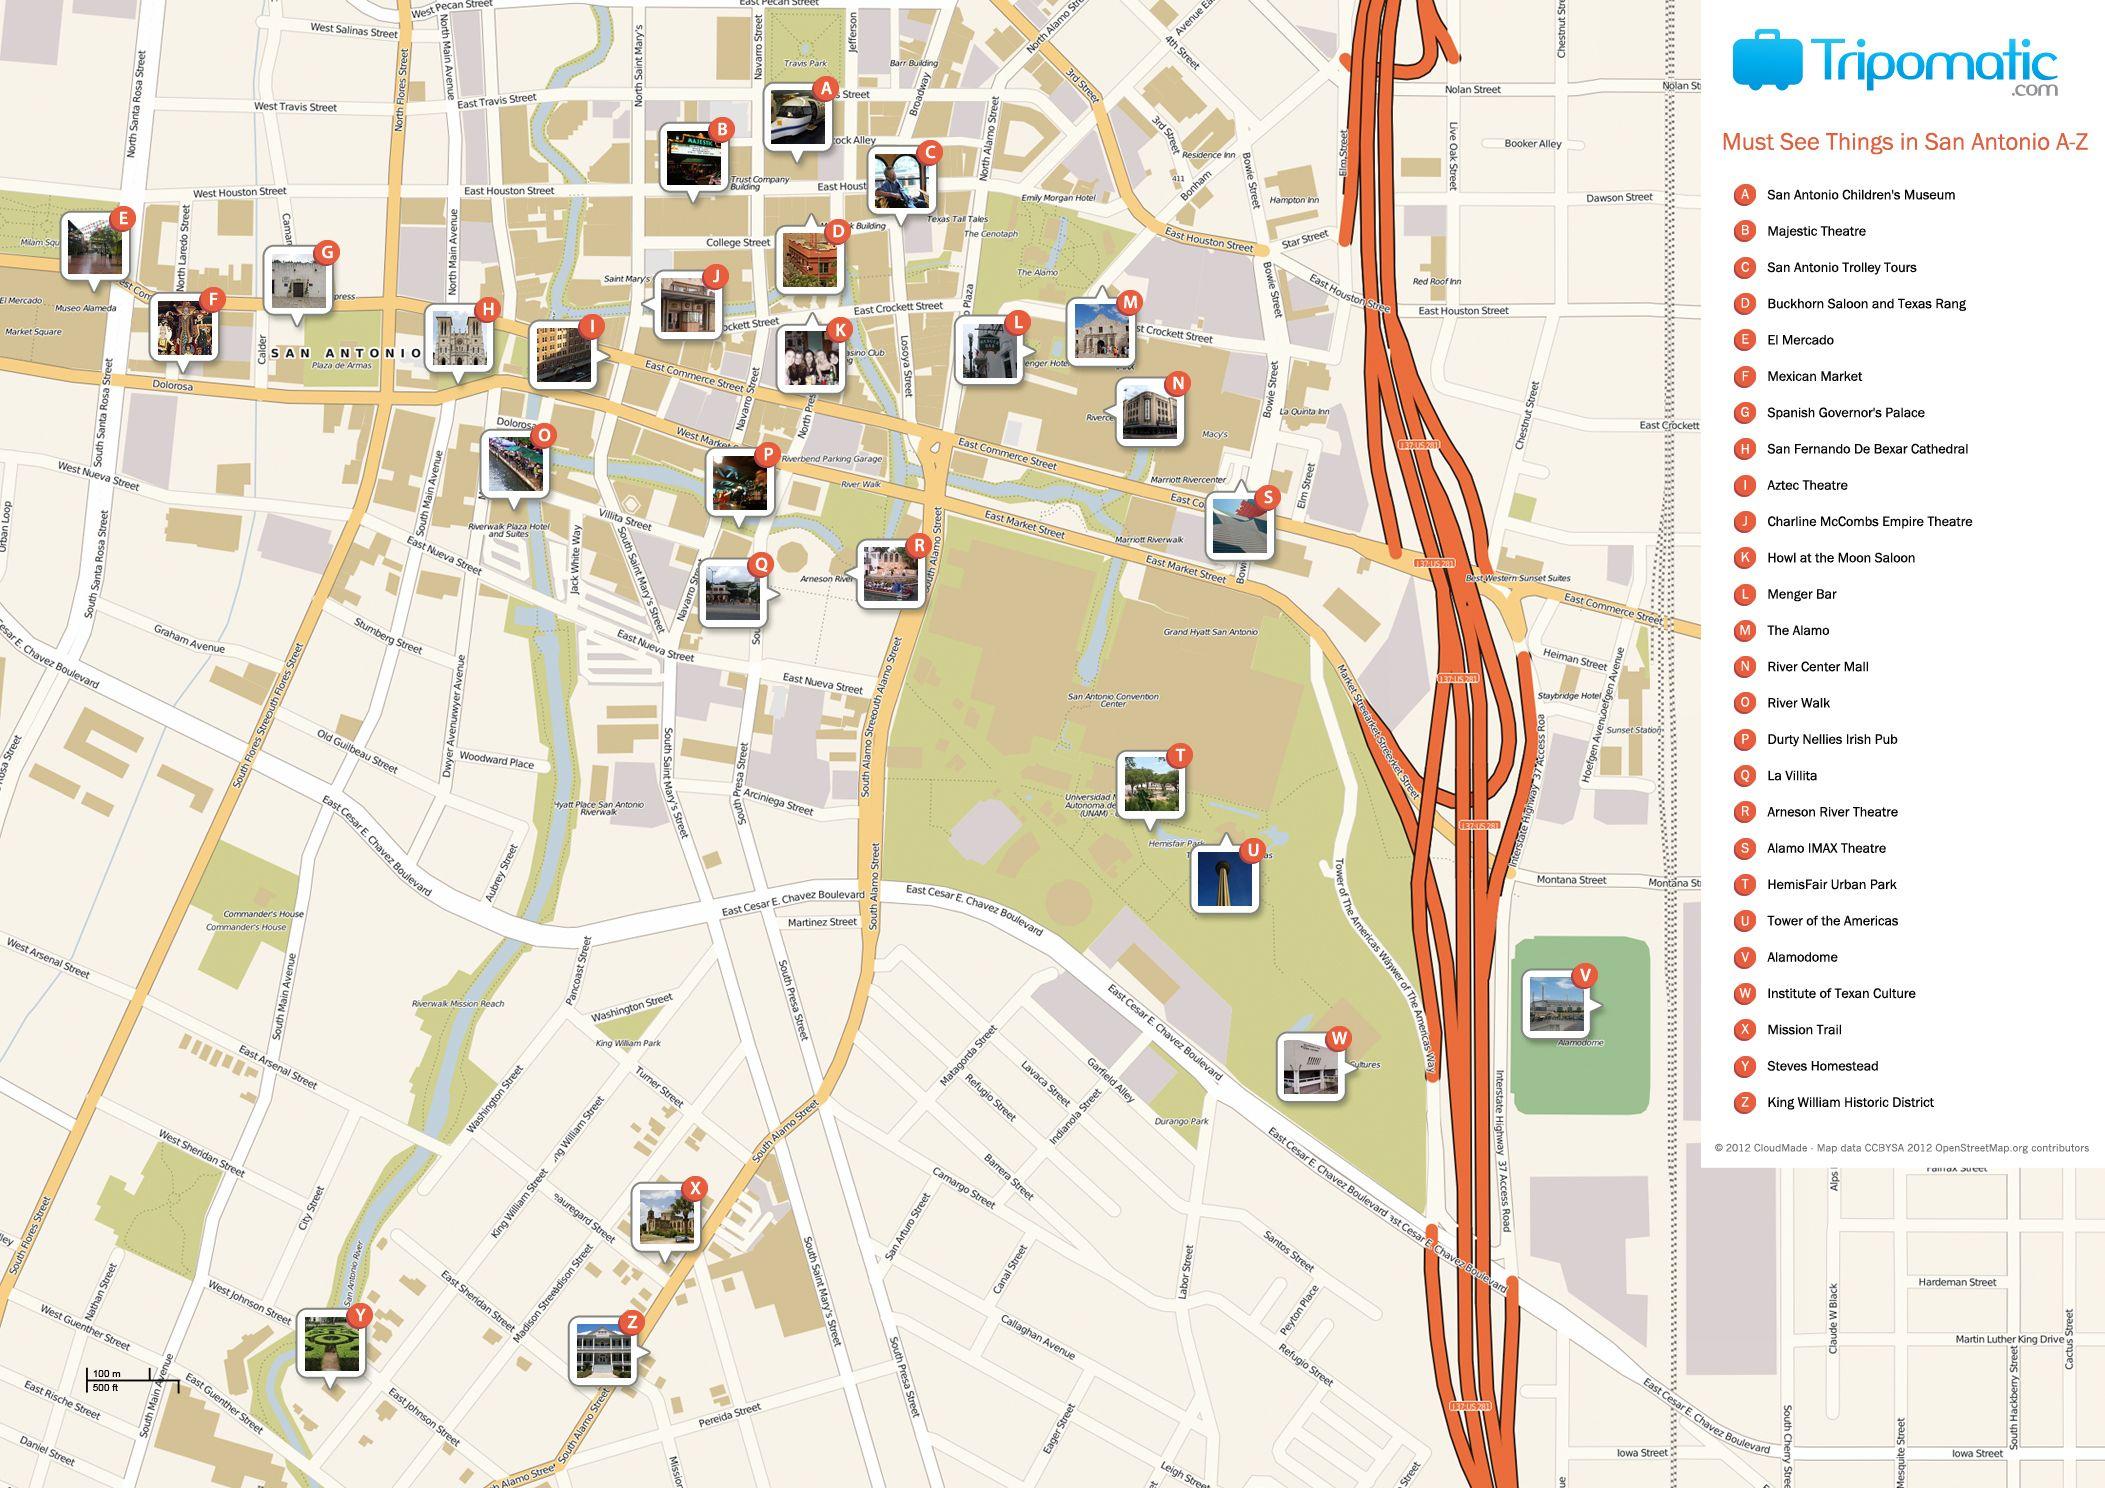 San Antonio Printable Tourist Map | Free Tourist Maps ✈ | Tourist - Roadside Attractions Texas Map